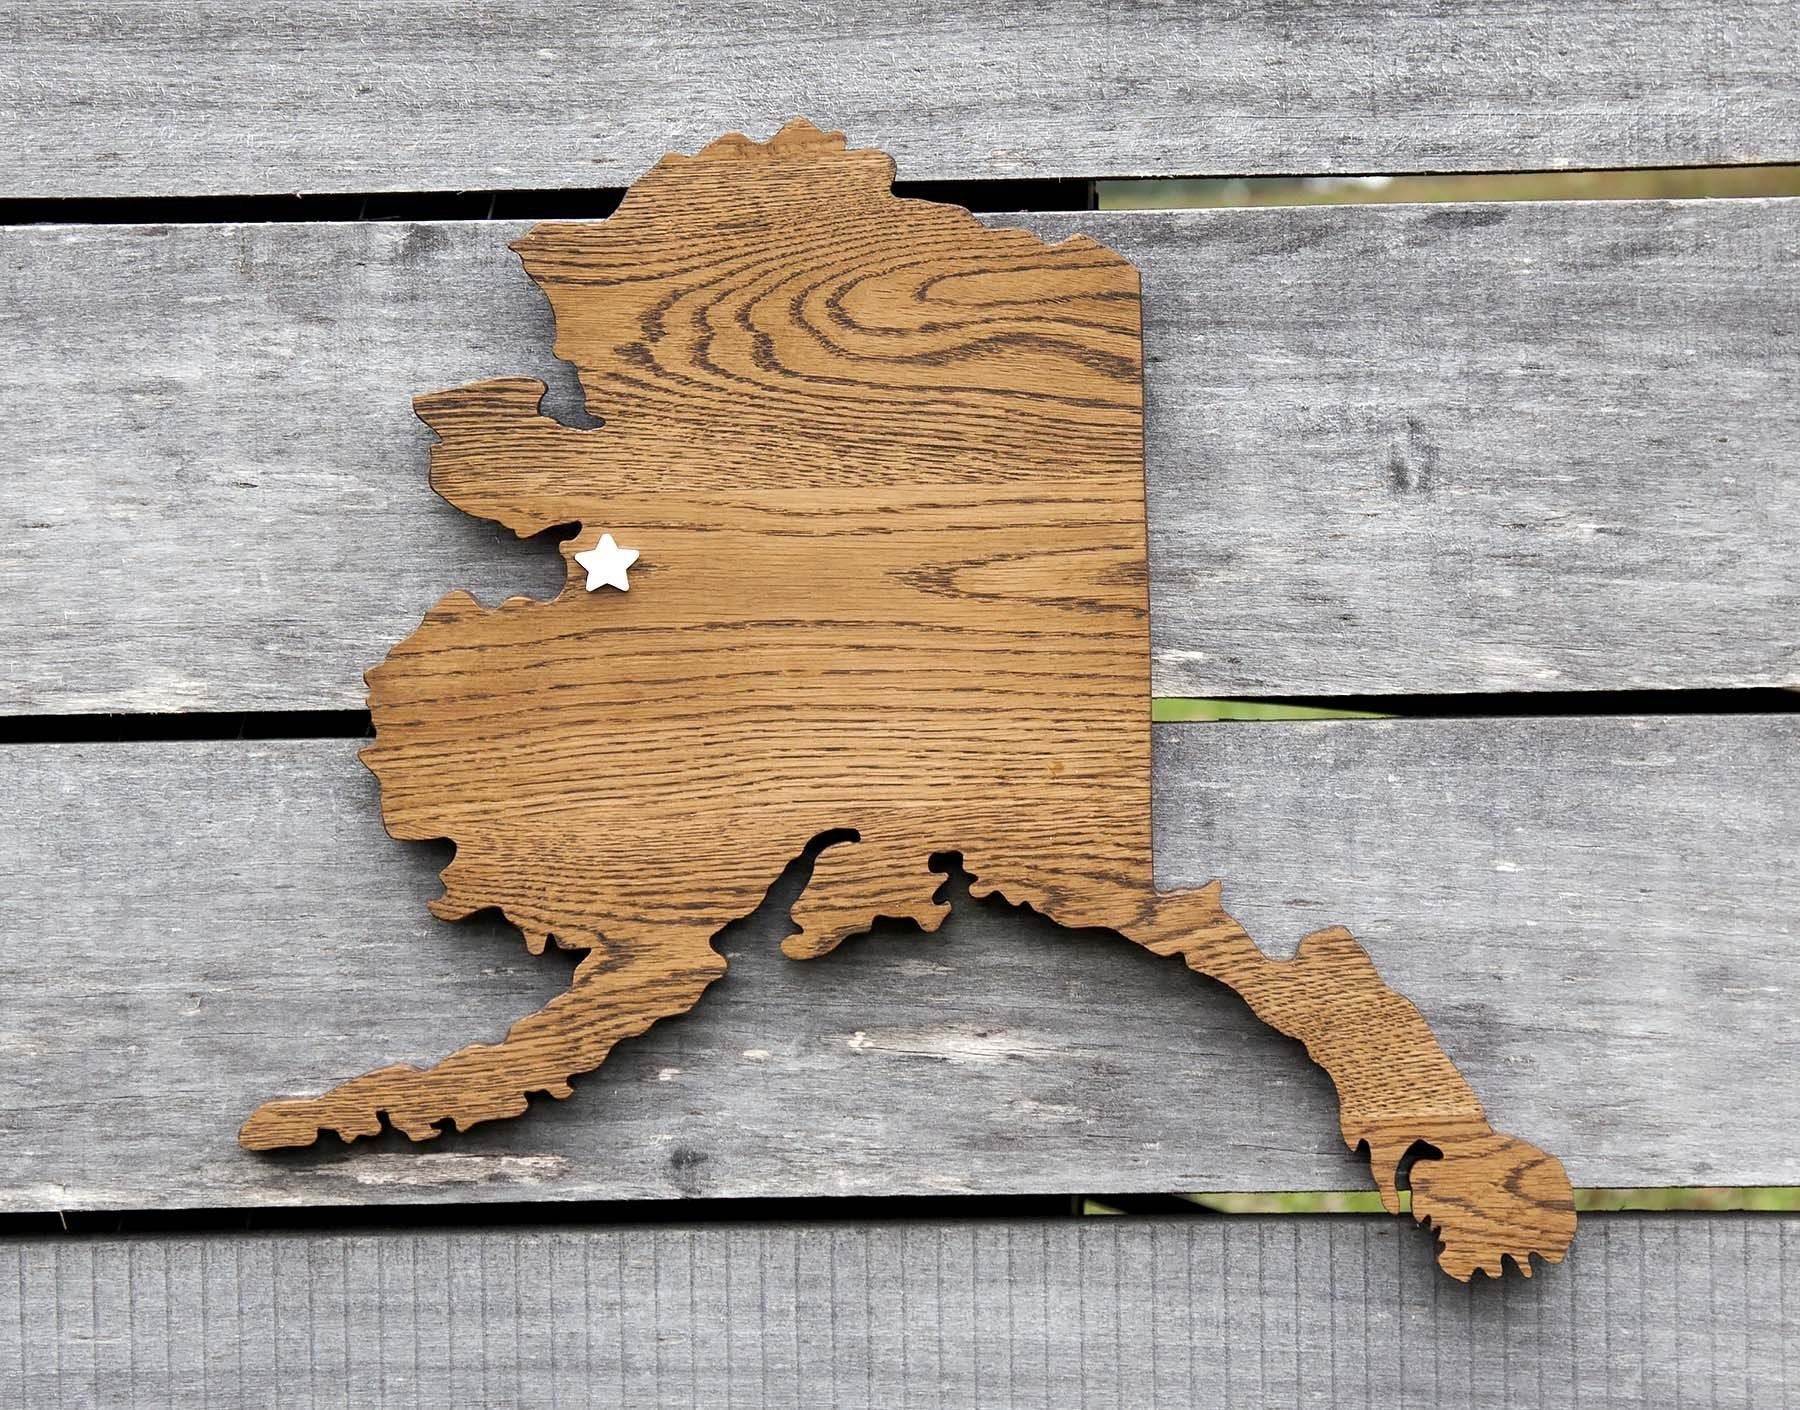 Co color art printing alaska - Alaska State Shape Wood Cutout Sign Wall Art In Oak 20 Wide 6